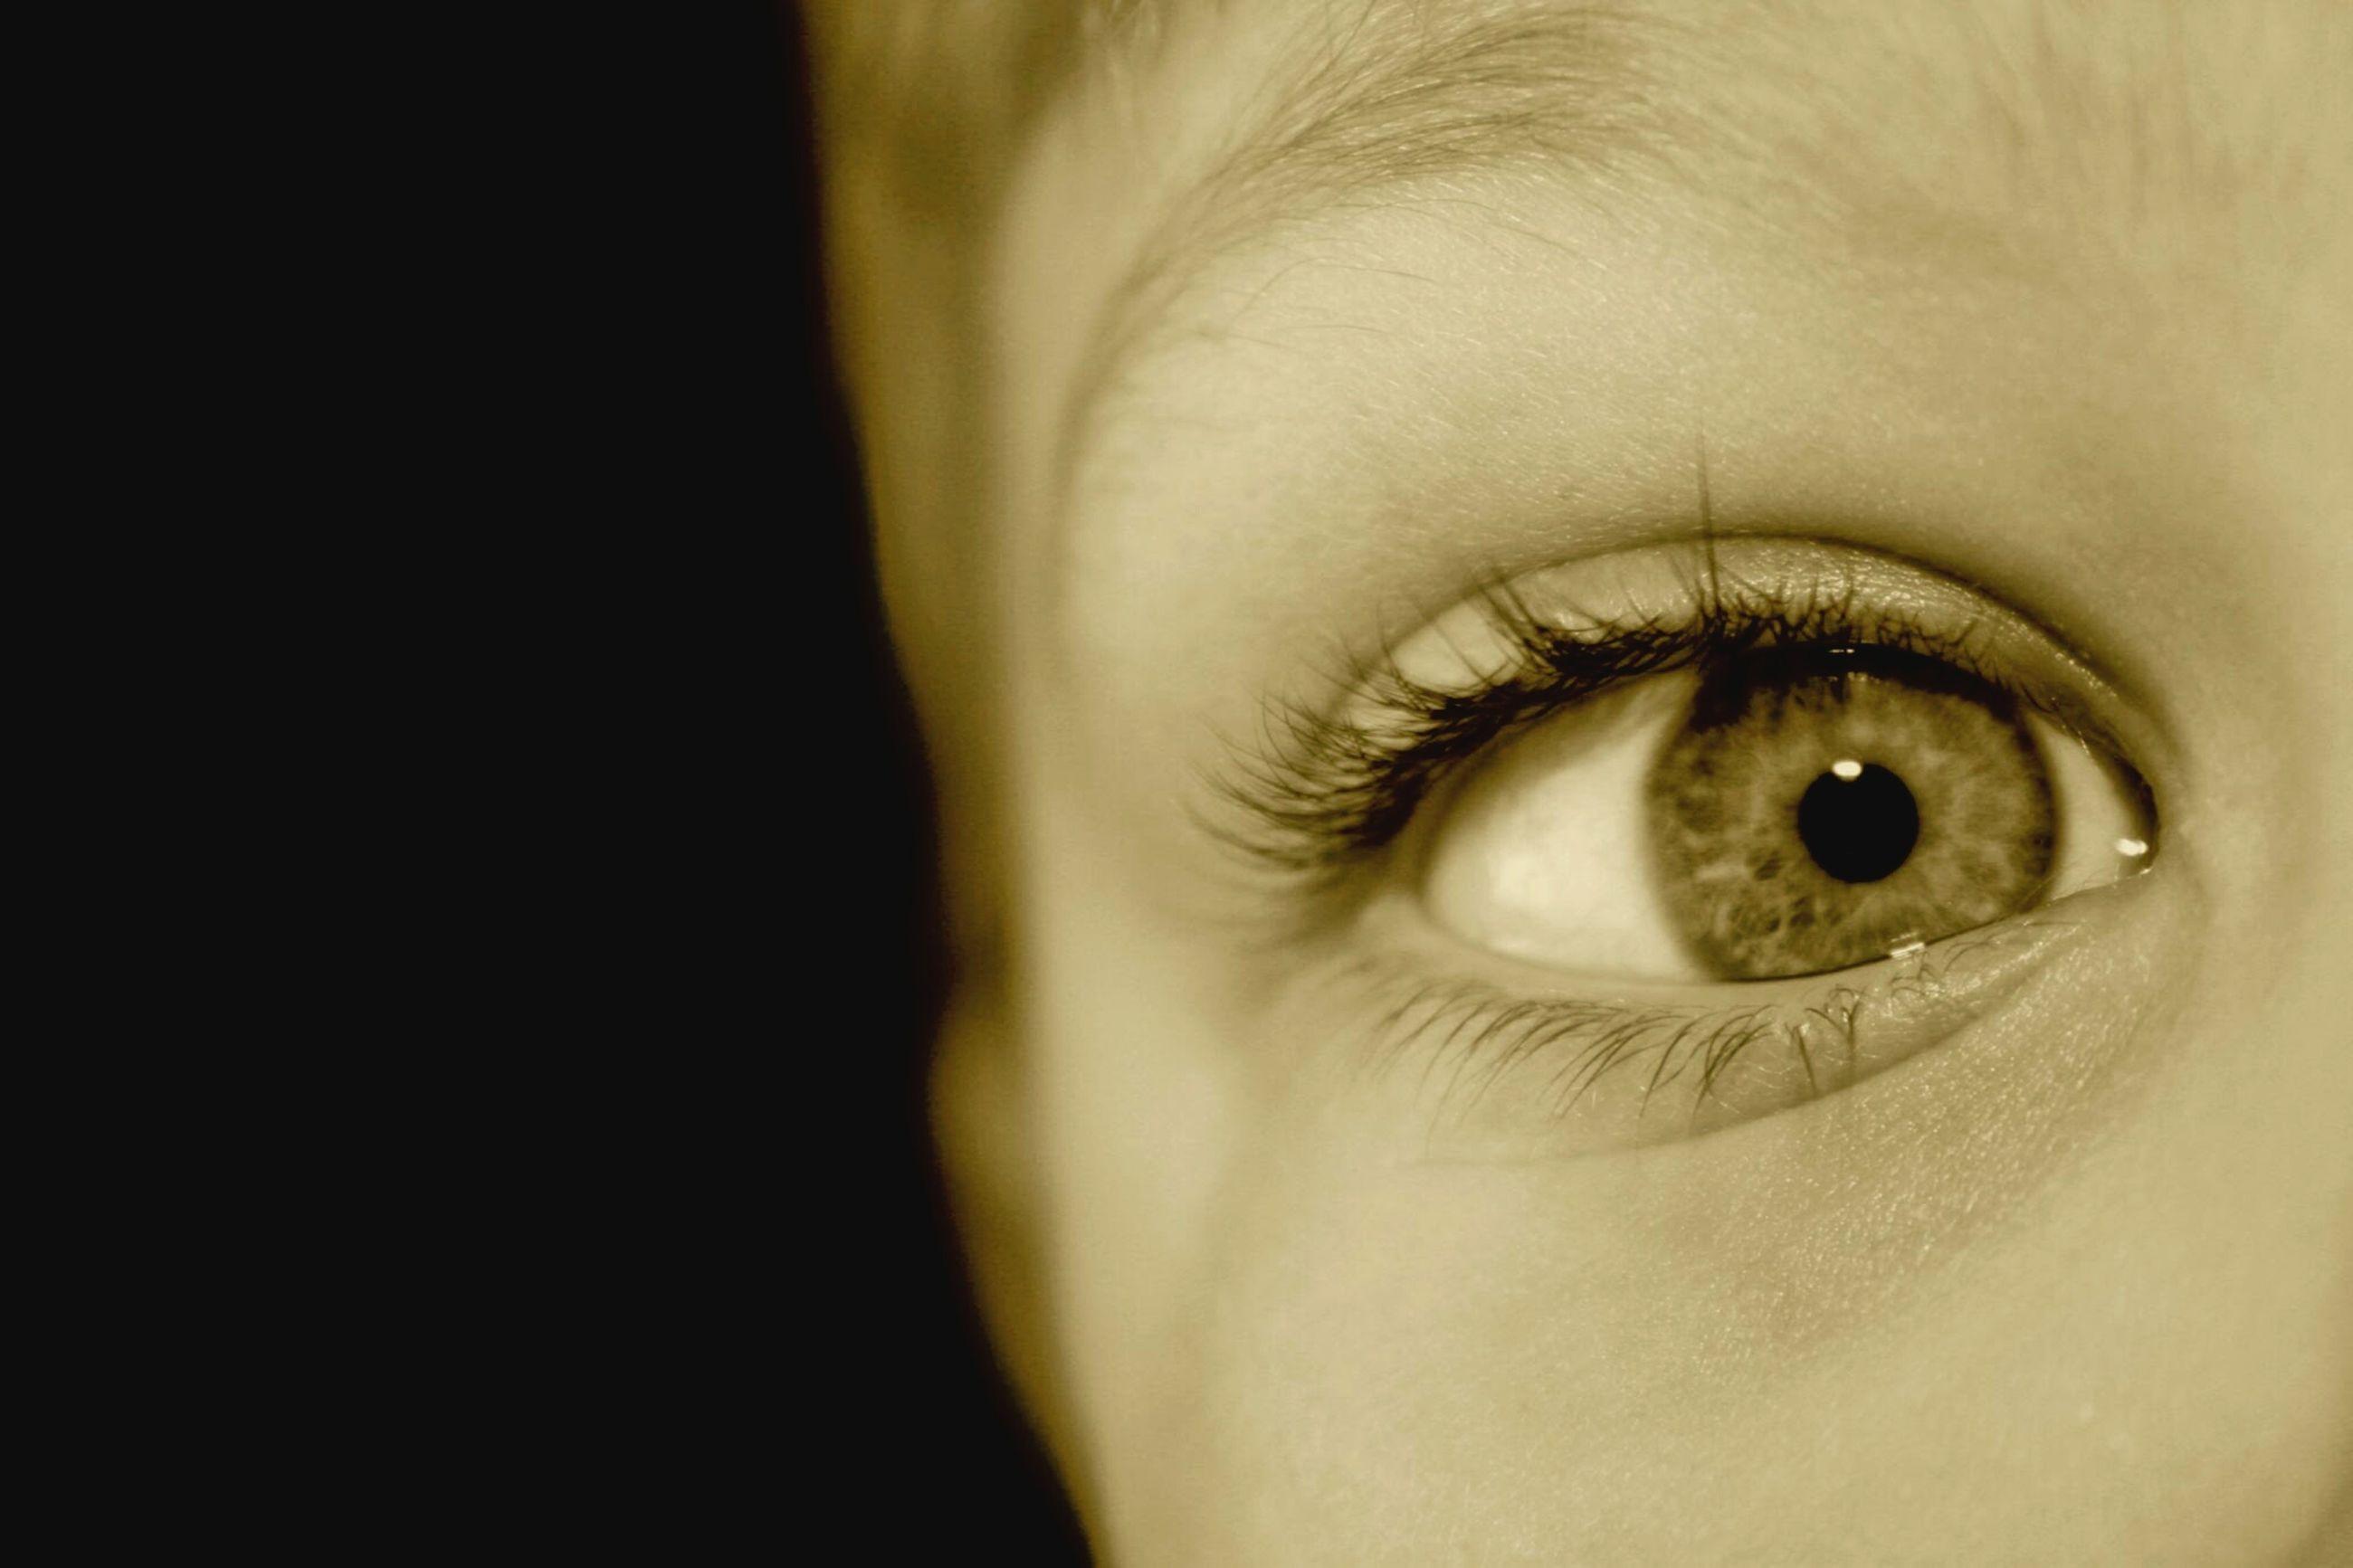 close-up, human eye, eyelash, part of, eyesight, human skin, sensory perception, looking at camera, human face, indoors, portrait, lifestyles, extreme close-up, studio shot, cropped, iris - eye, person